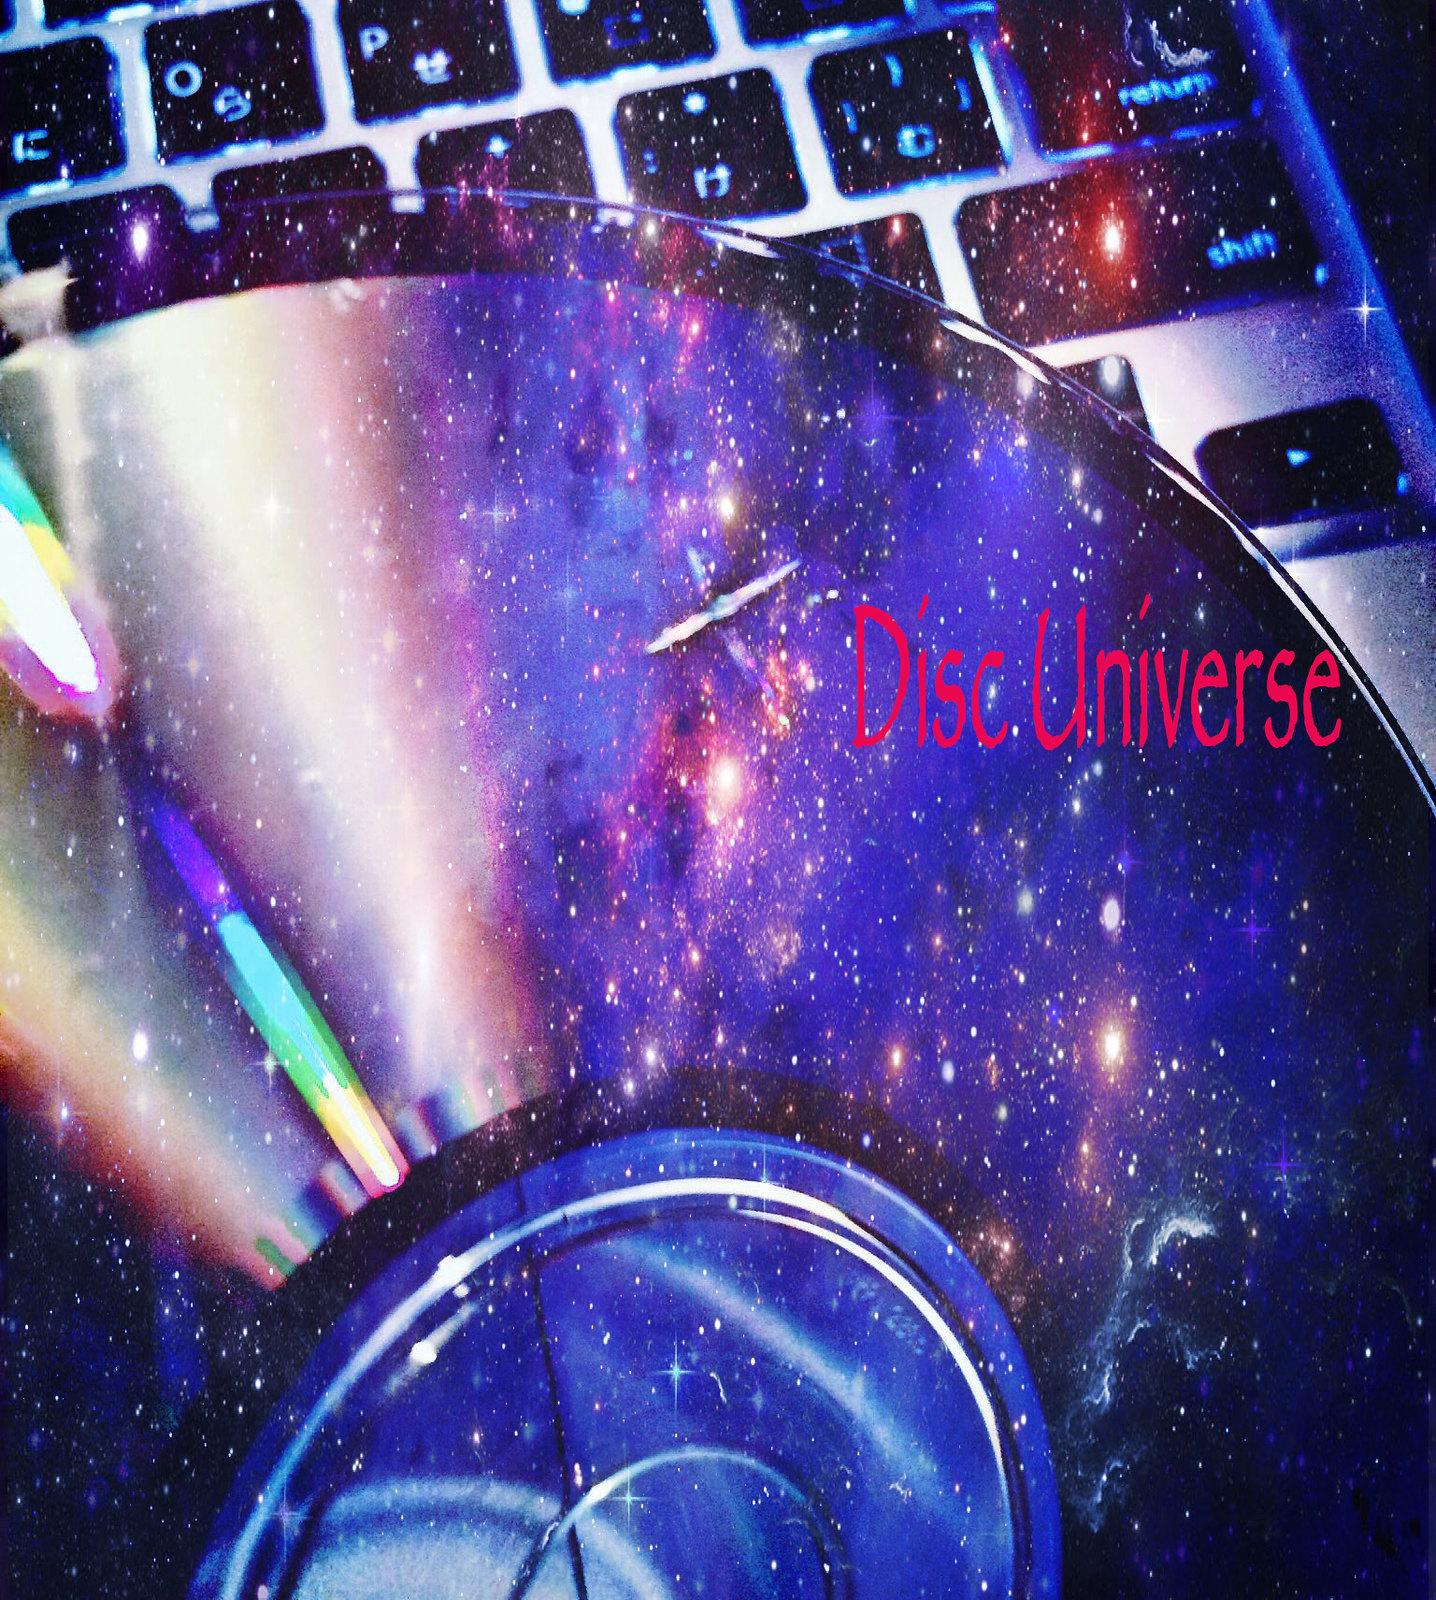 Disc Universe